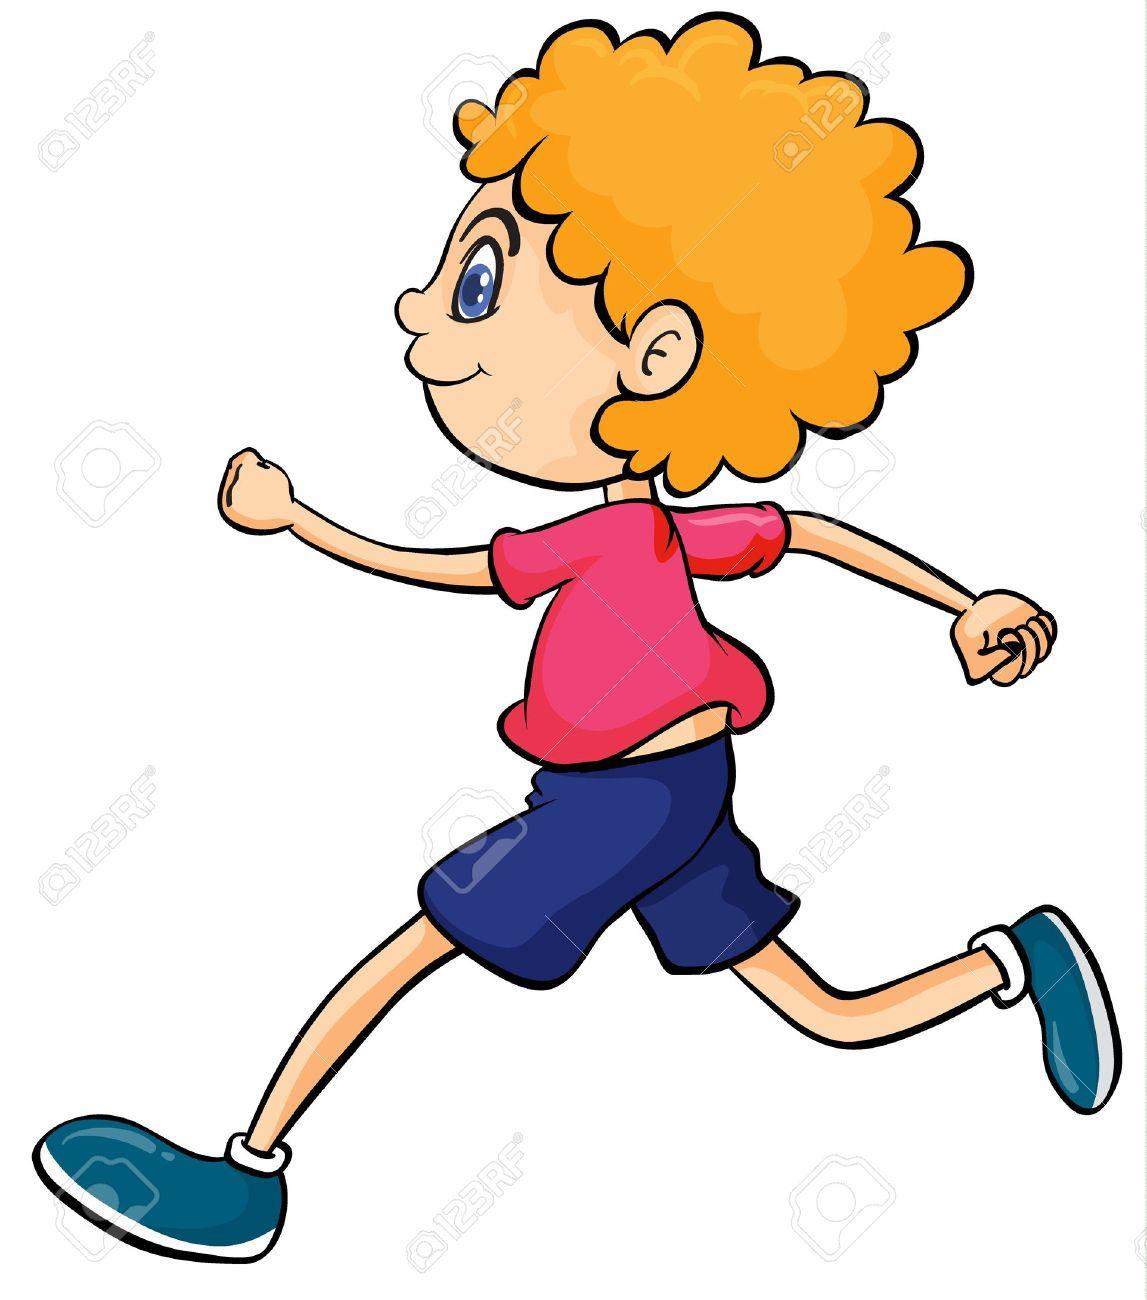 Cartoon Person Running Clipart